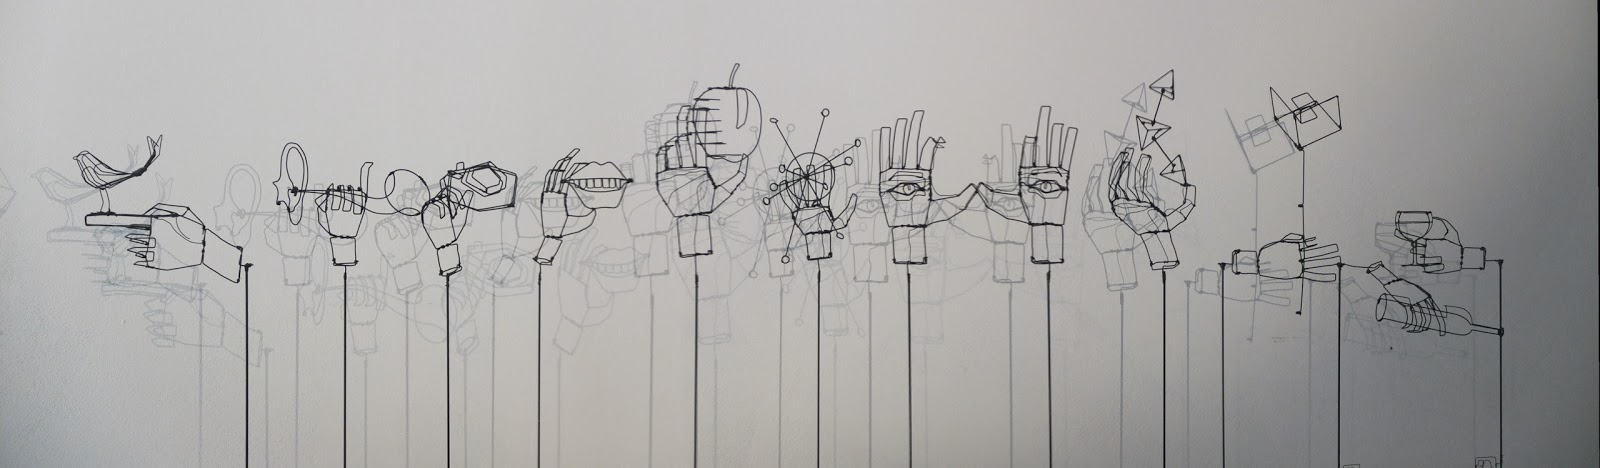 little shrubbery et au fil defer sculptures en fil de fer wire sculptures. Black Bedroom Furniture Sets. Home Design Ideas